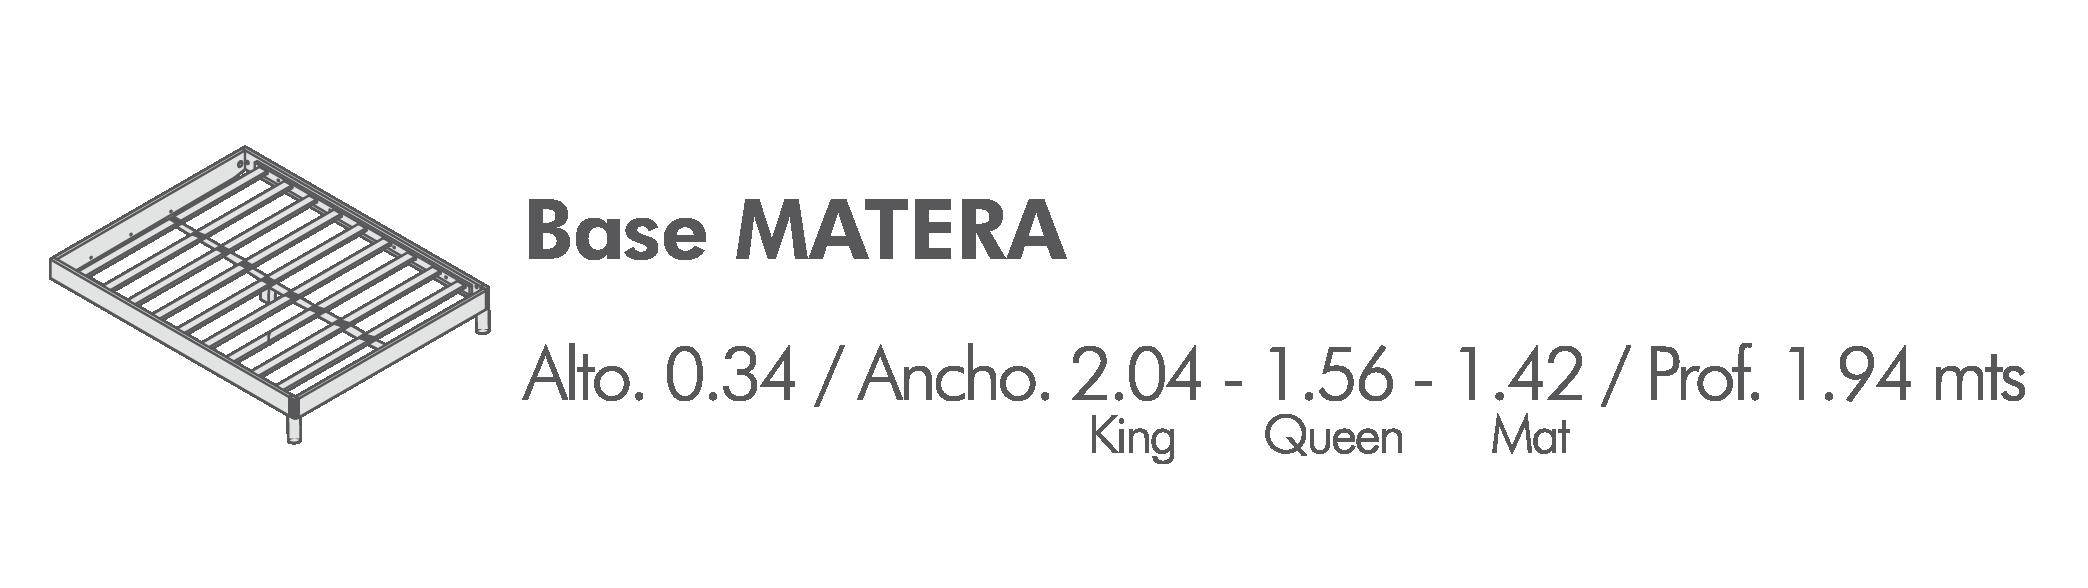 isometrico-base-matera.png